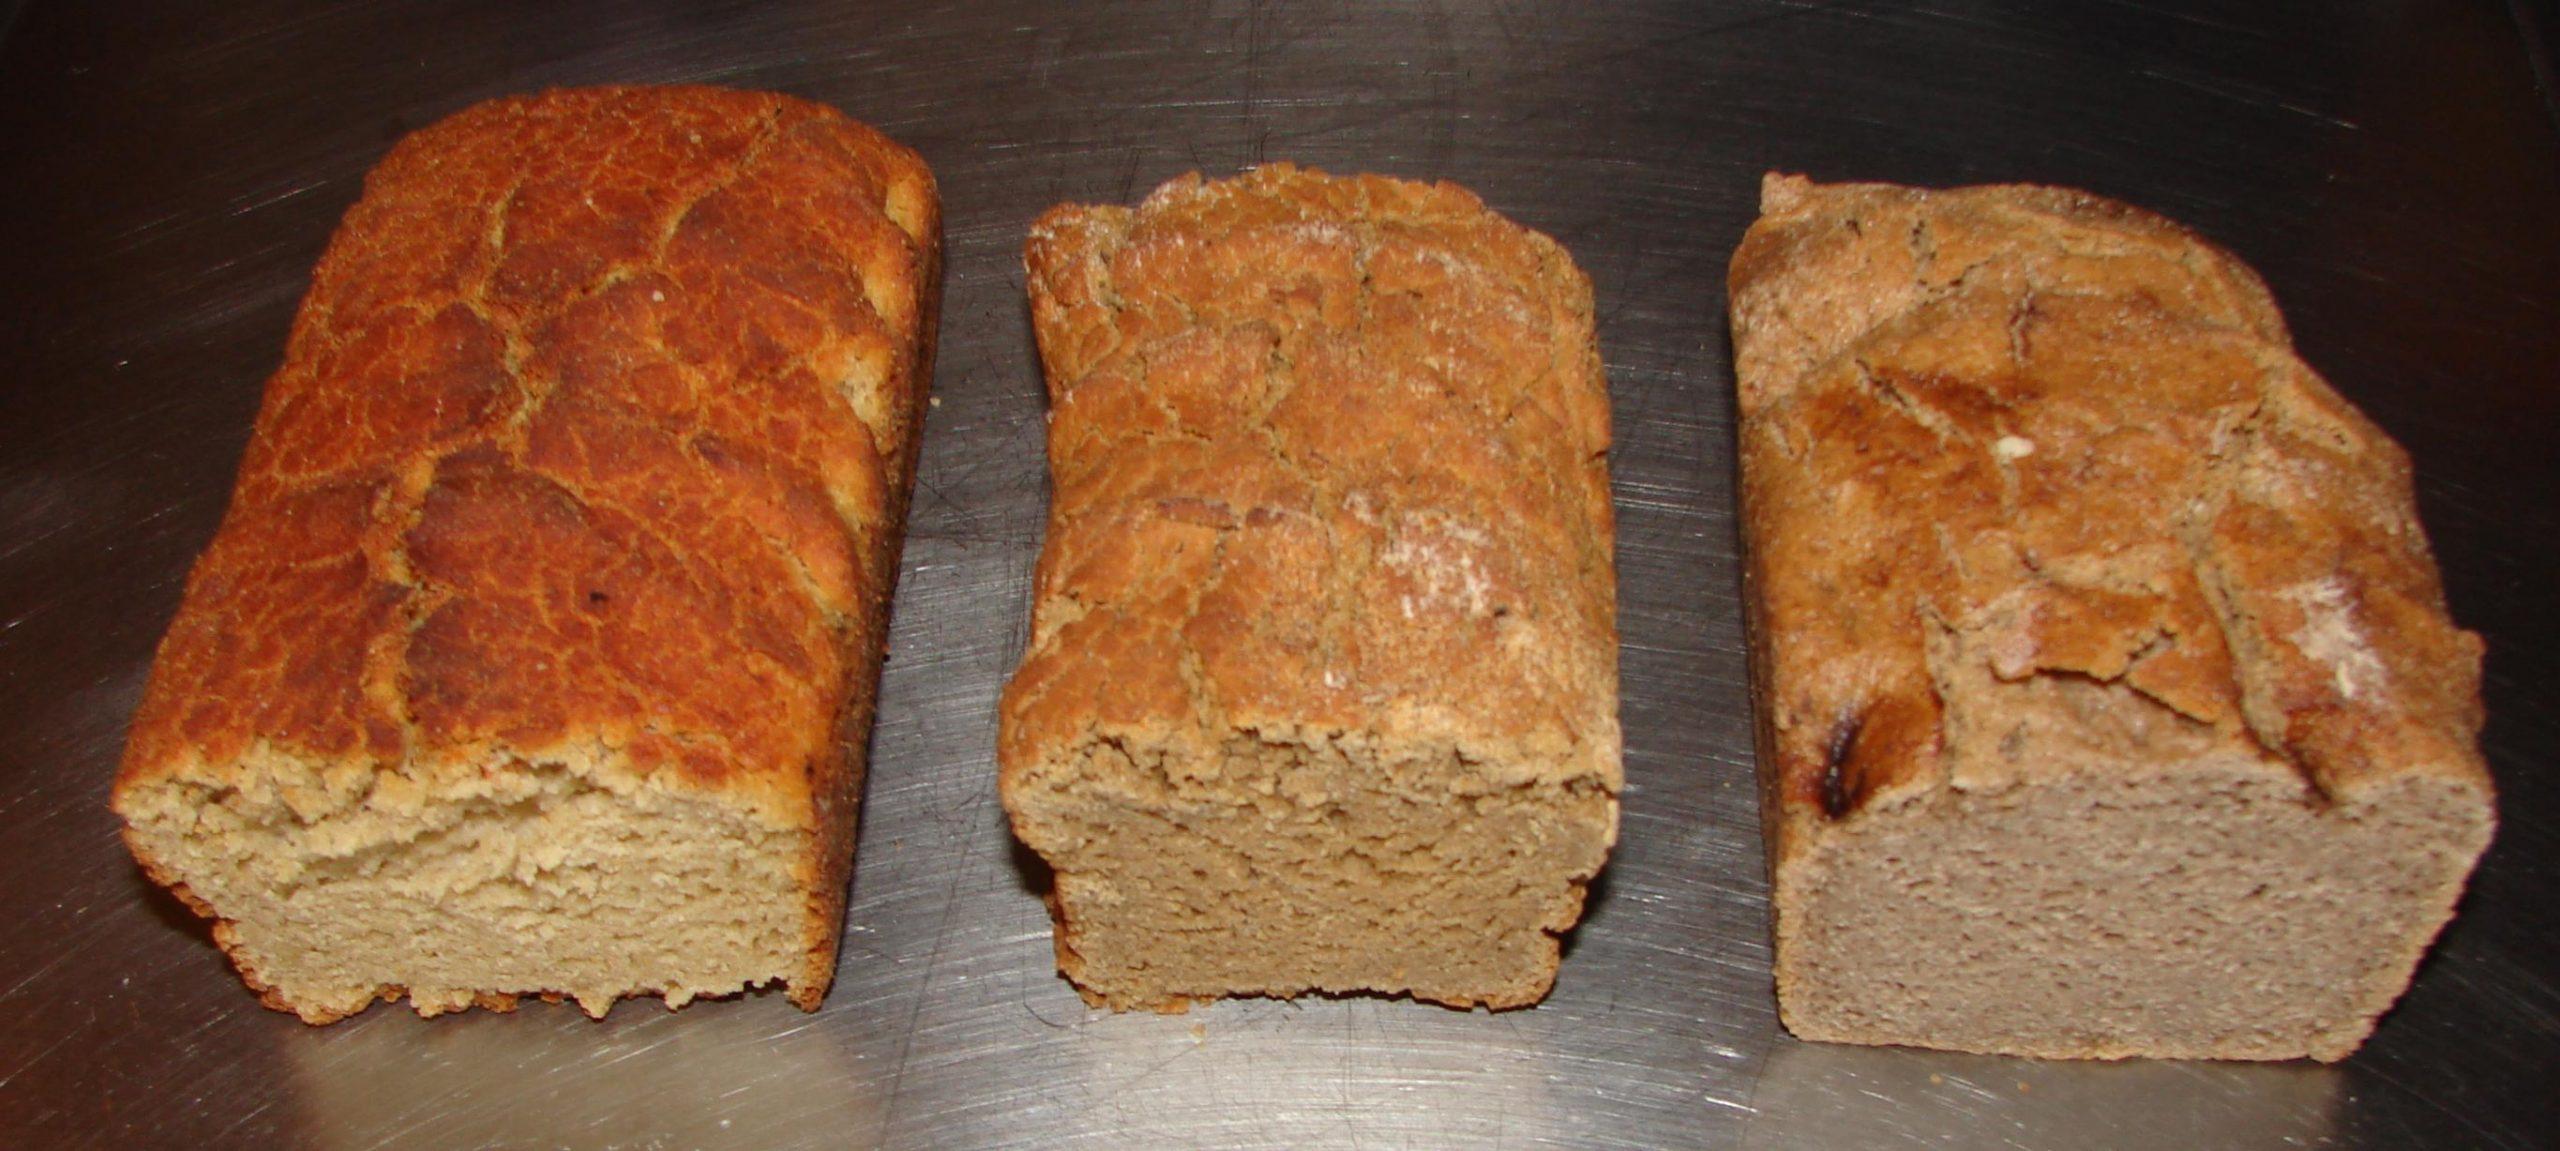 glutenvrij brood recept